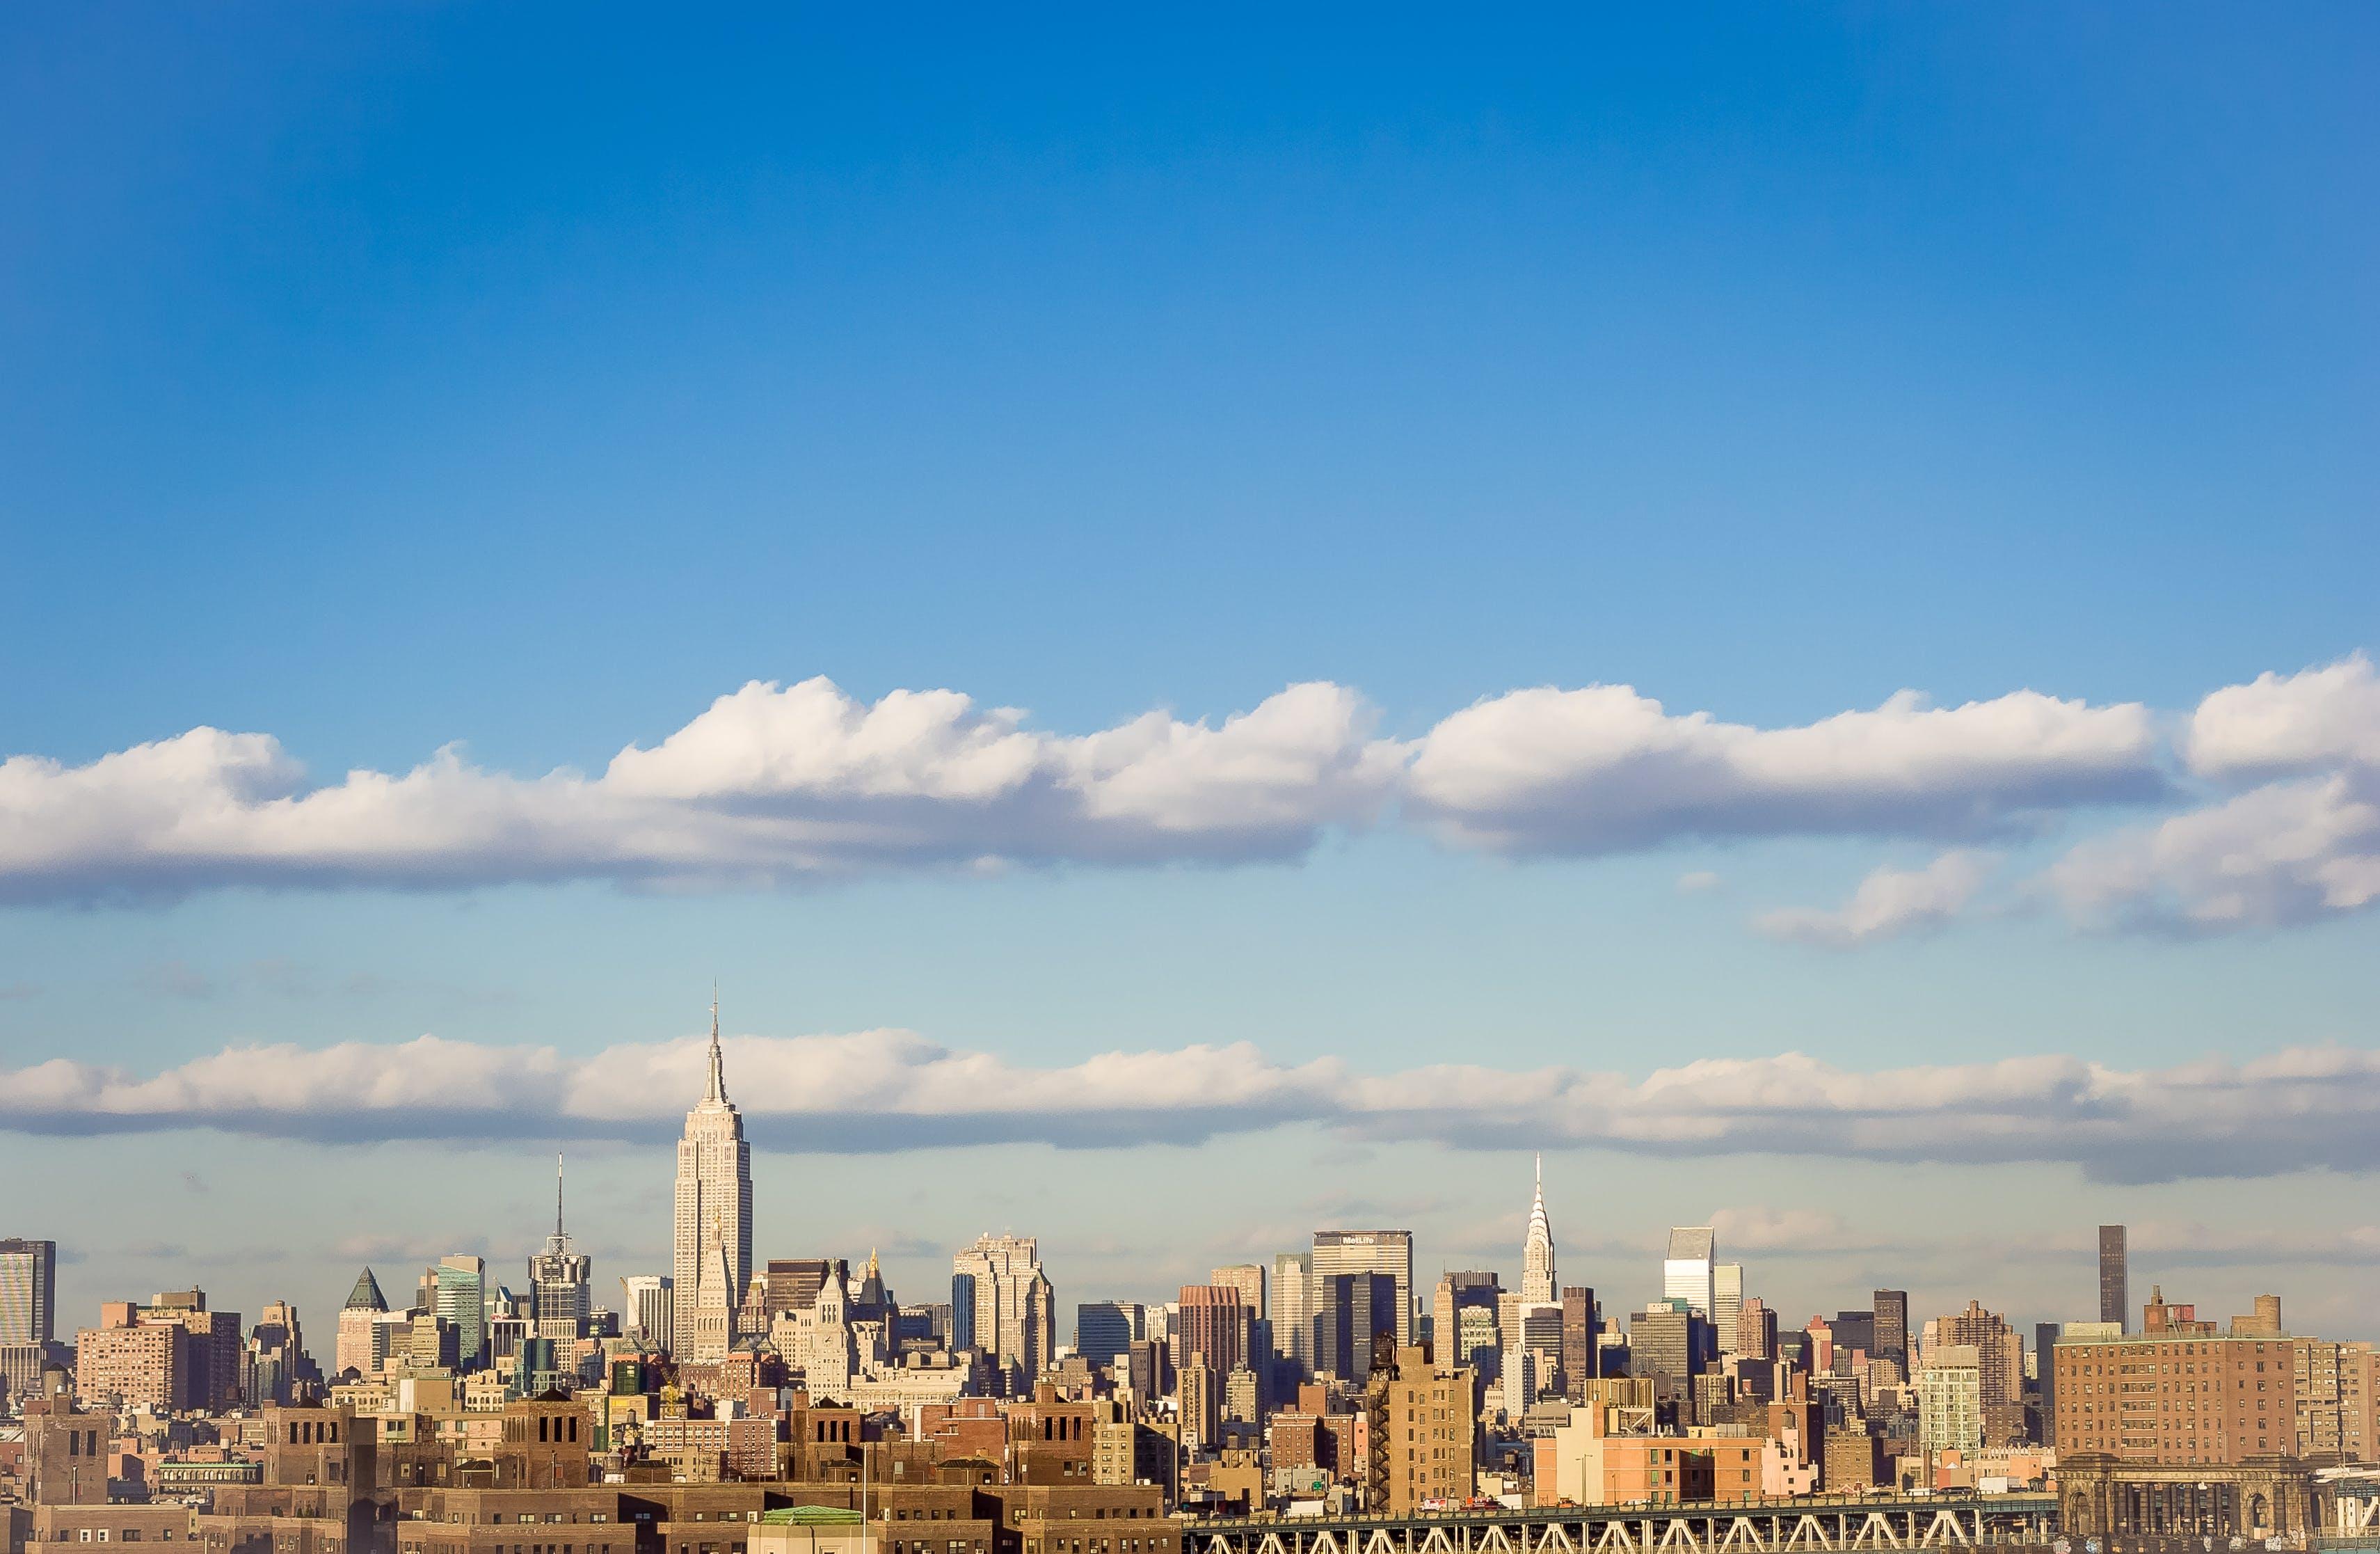 Kostnadsfri bild av arkitektur, byggnader, dagsljus, Empire State Building